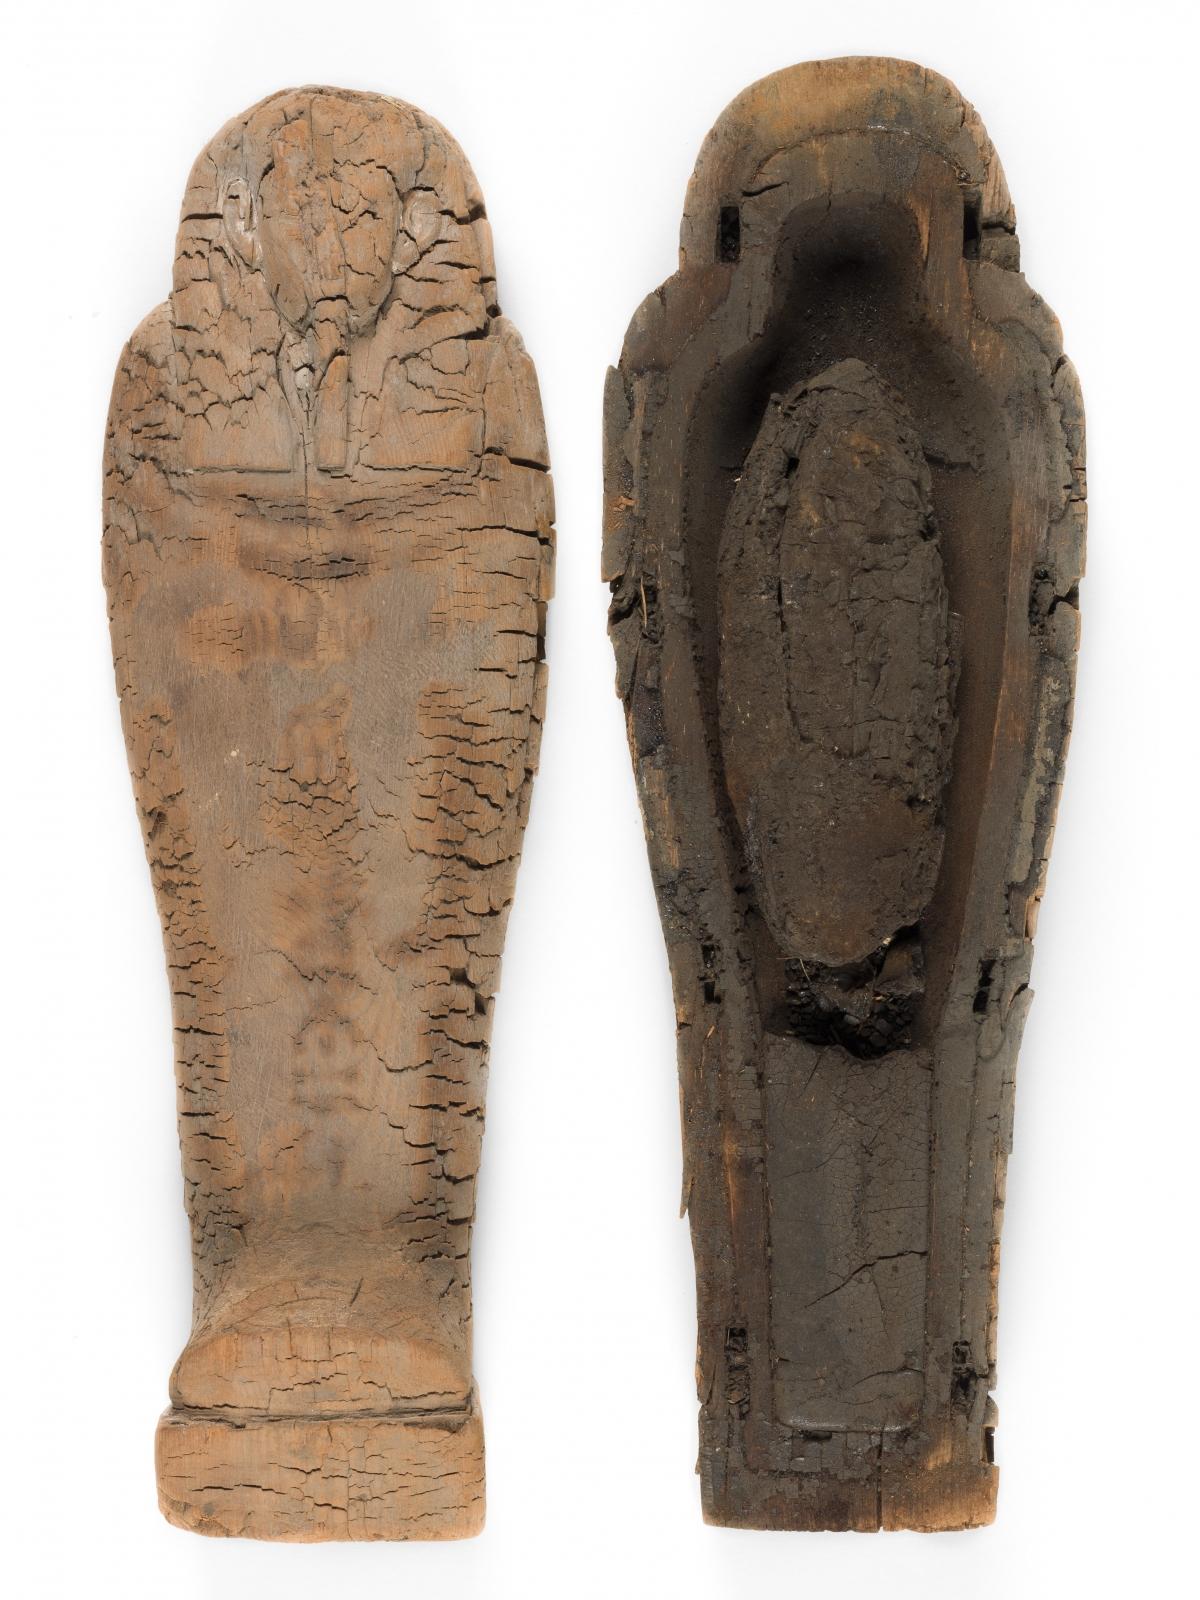 mummified foetus